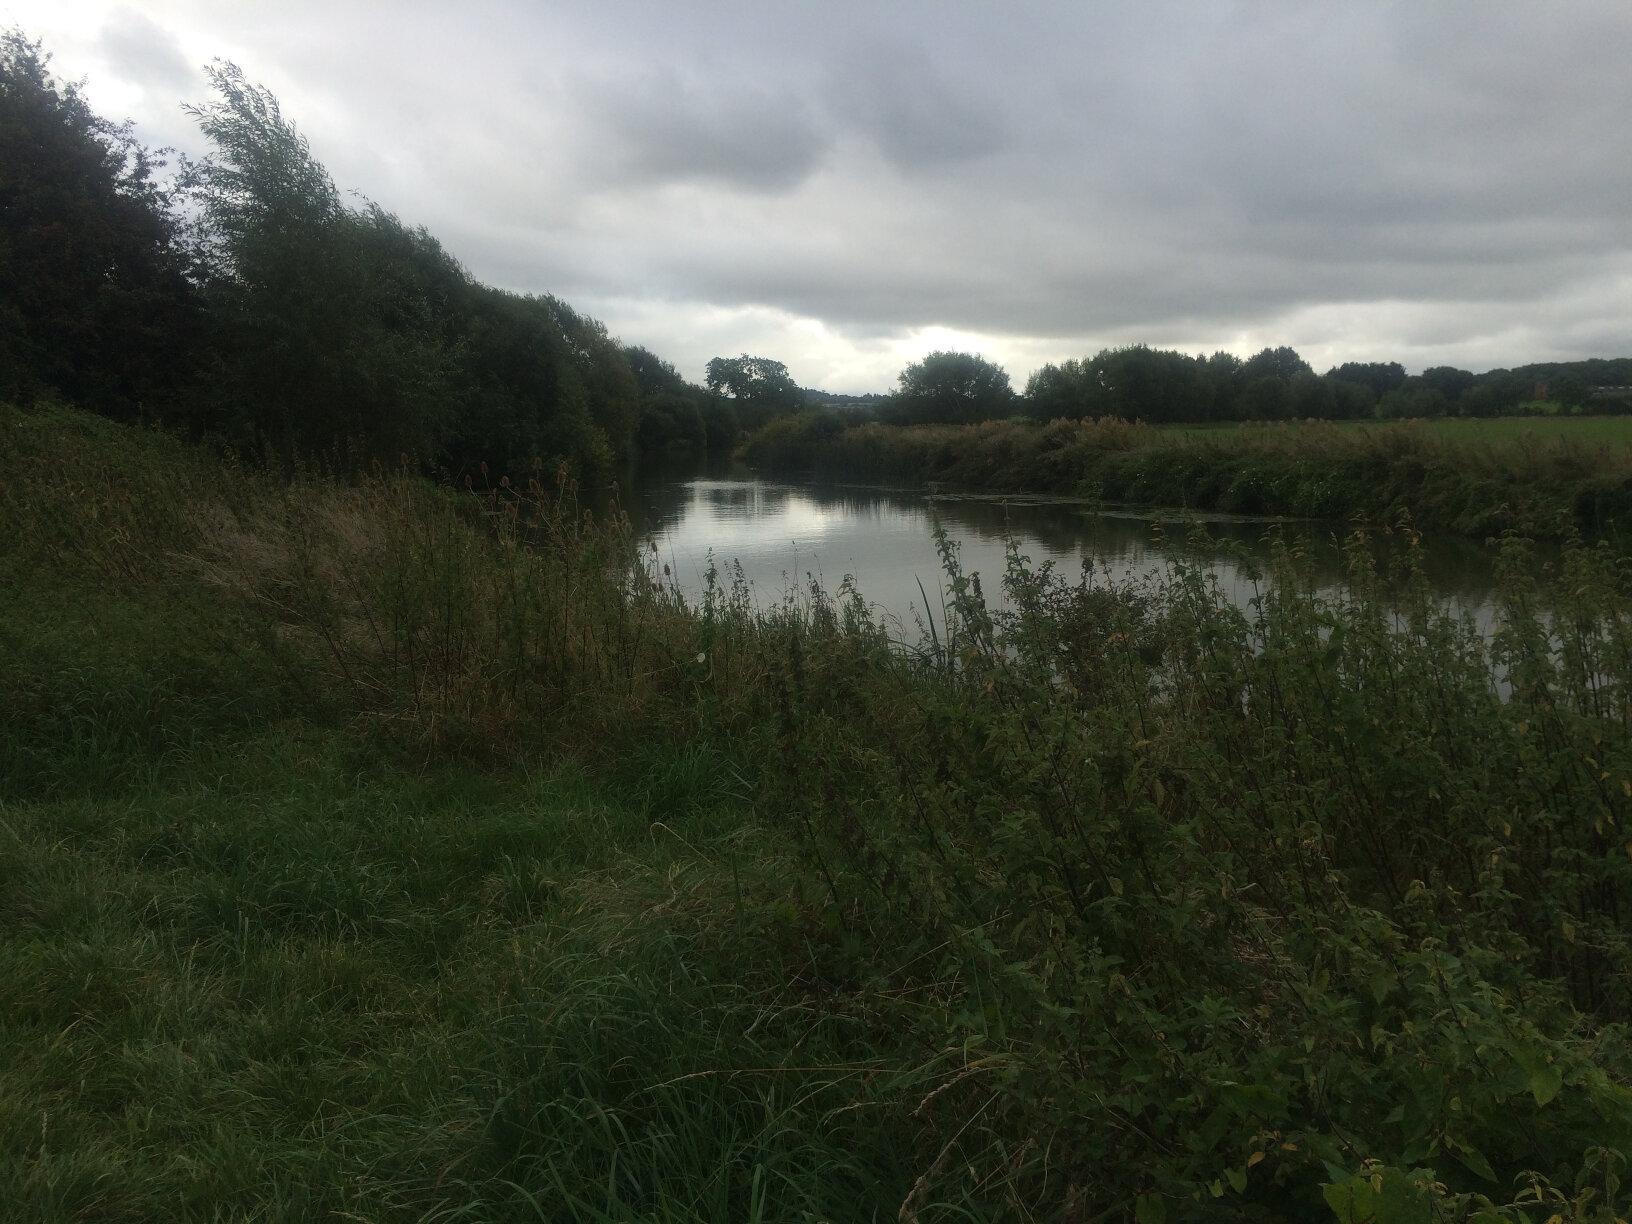 From Lechlade to Newbridge (31)